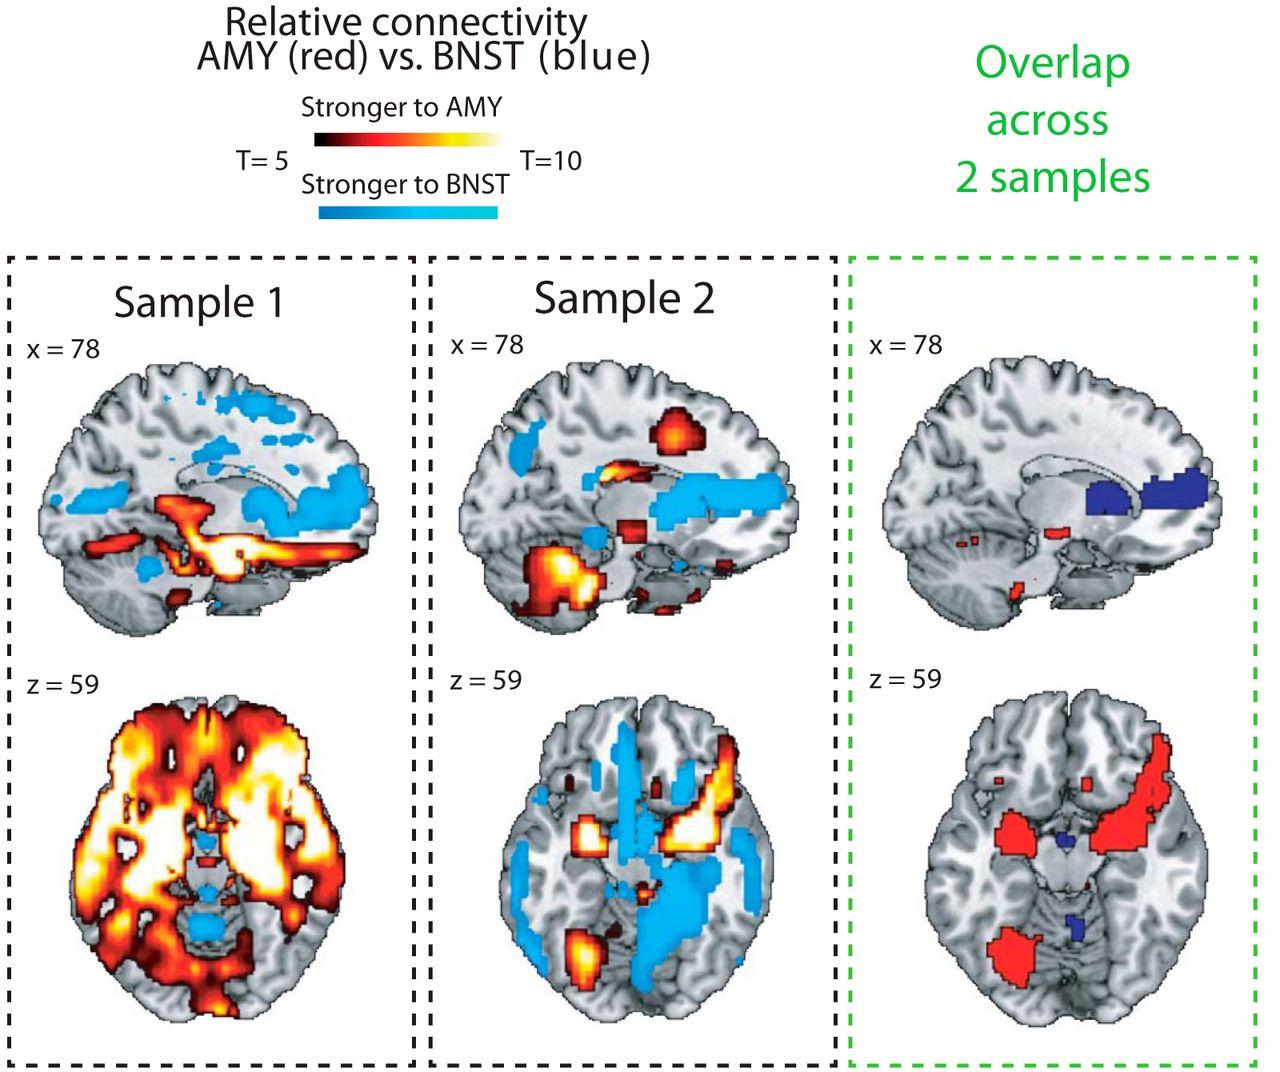 How Human Amygdala And Bed Nucleus Of The Stria Terminalis May Drive